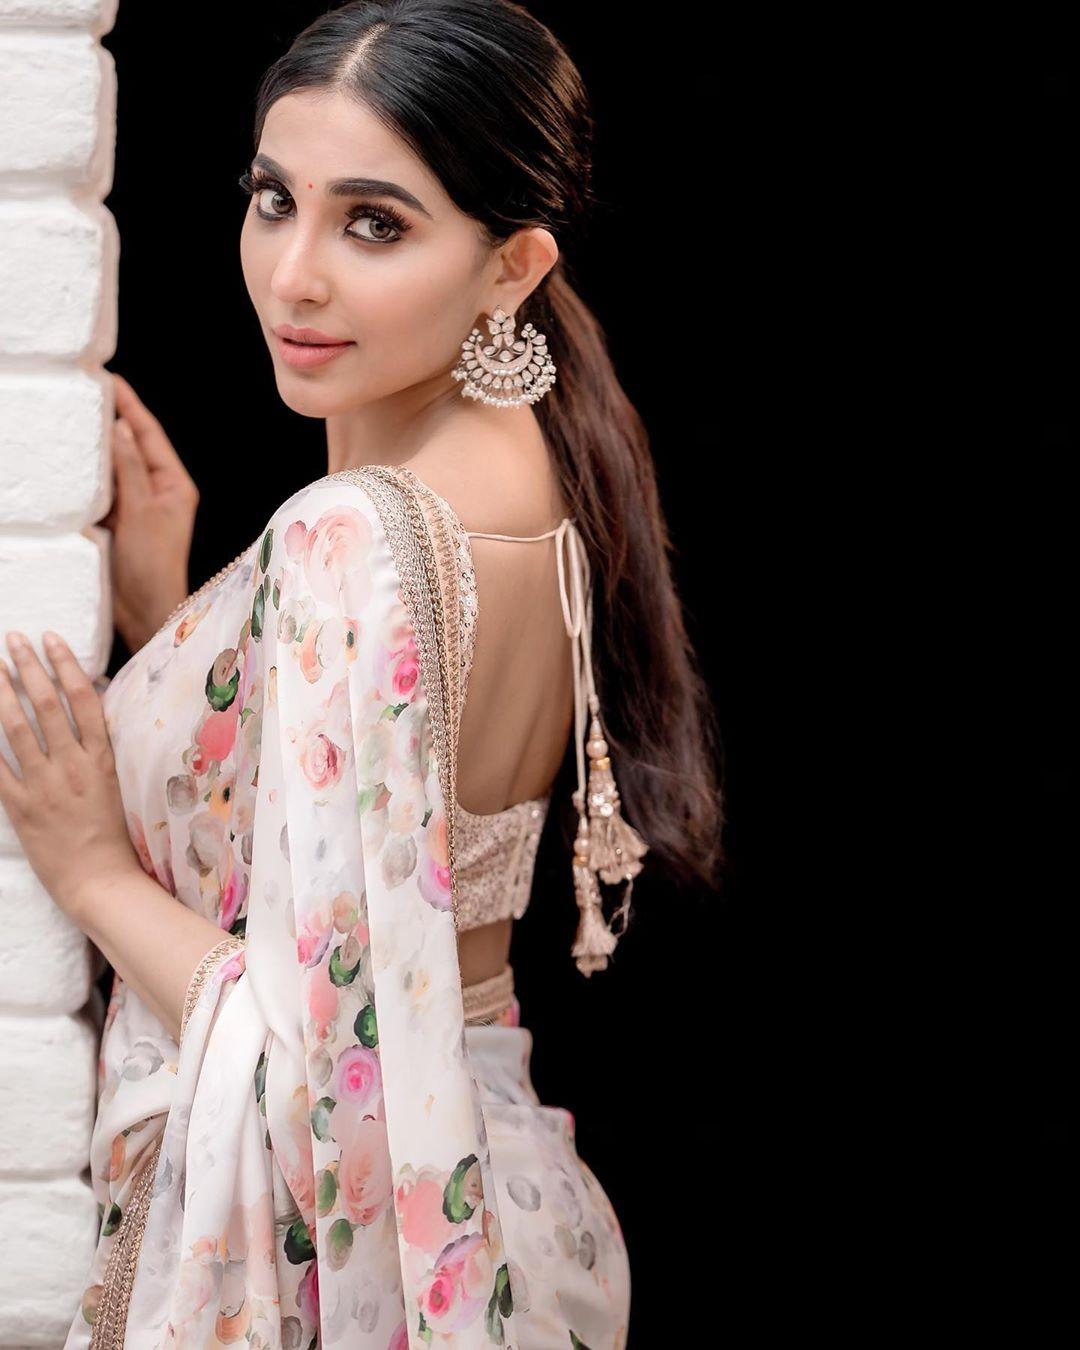 Parvati nair photos (19)